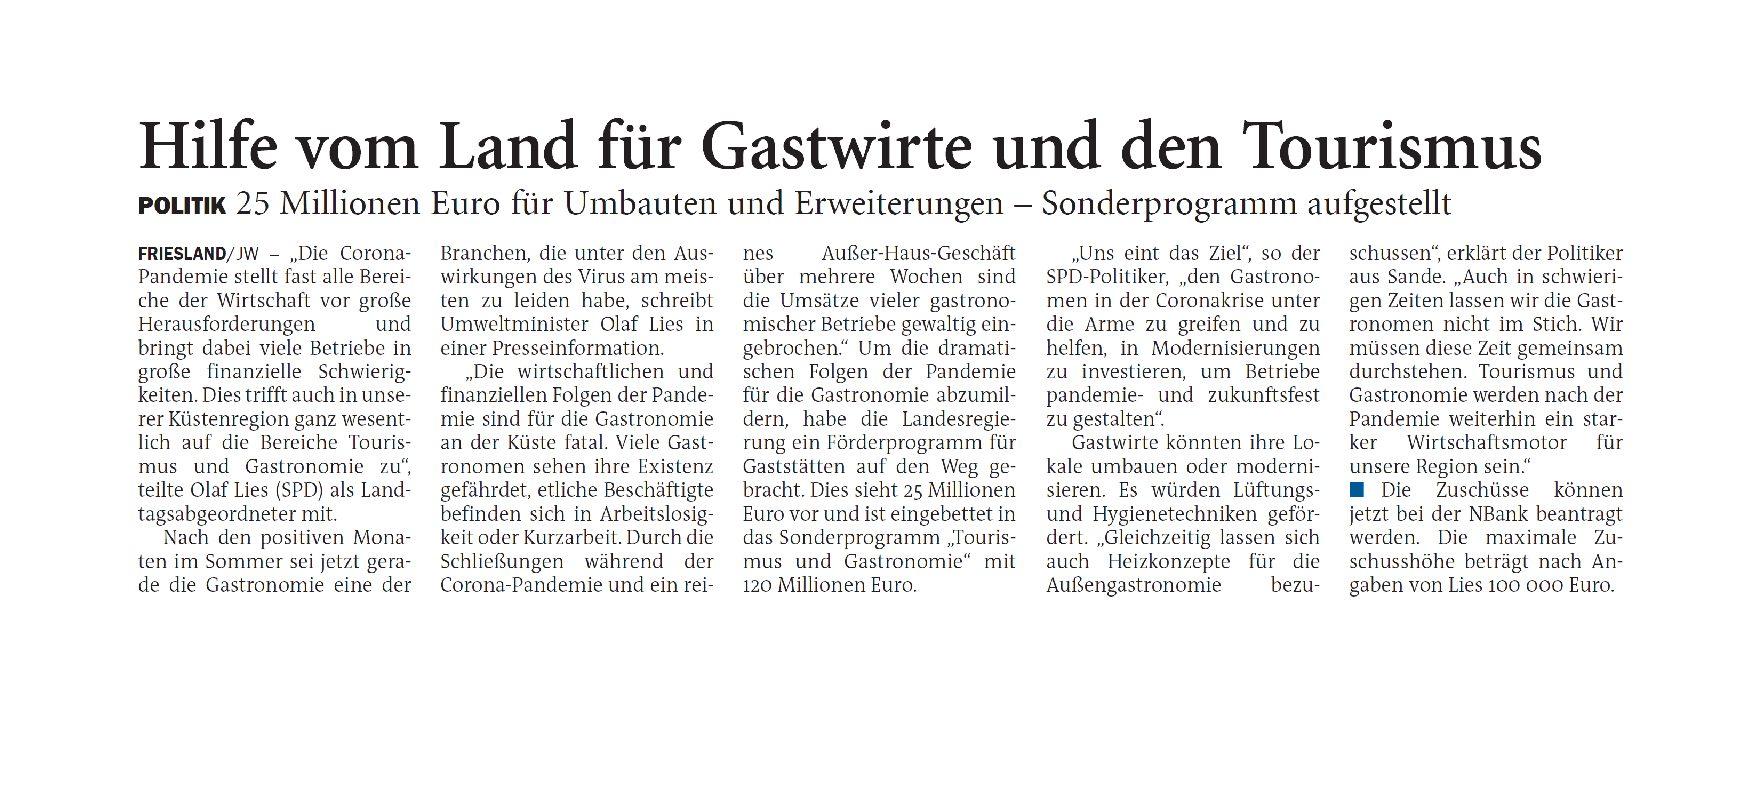 Jeversches Wochenblatt 30.11.2020 III